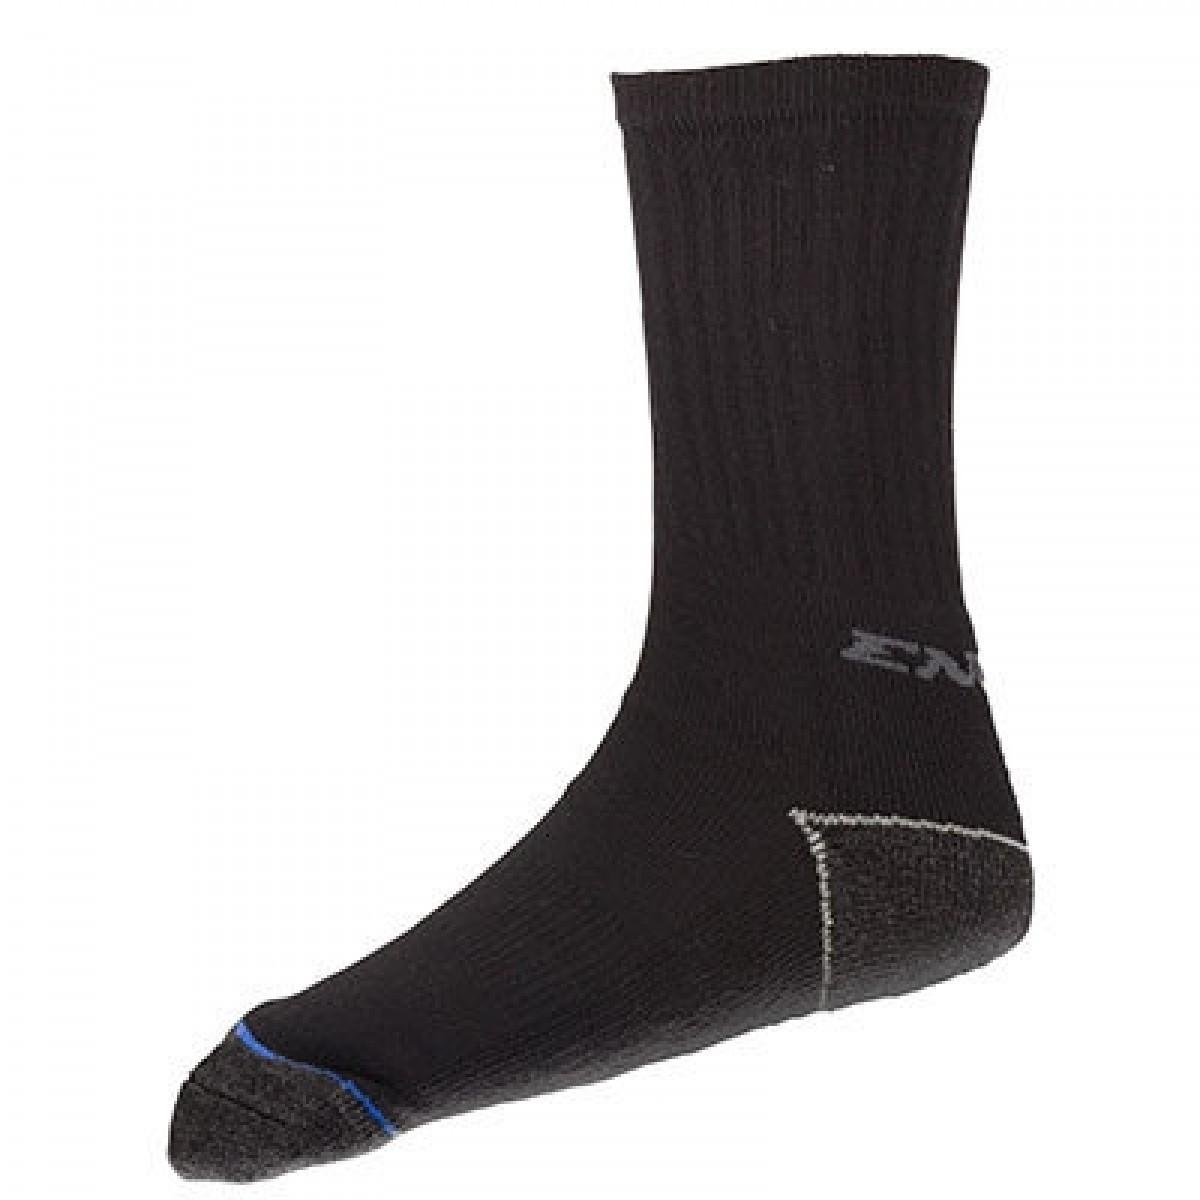 F. Engel Coolmax sokker med lycra-31